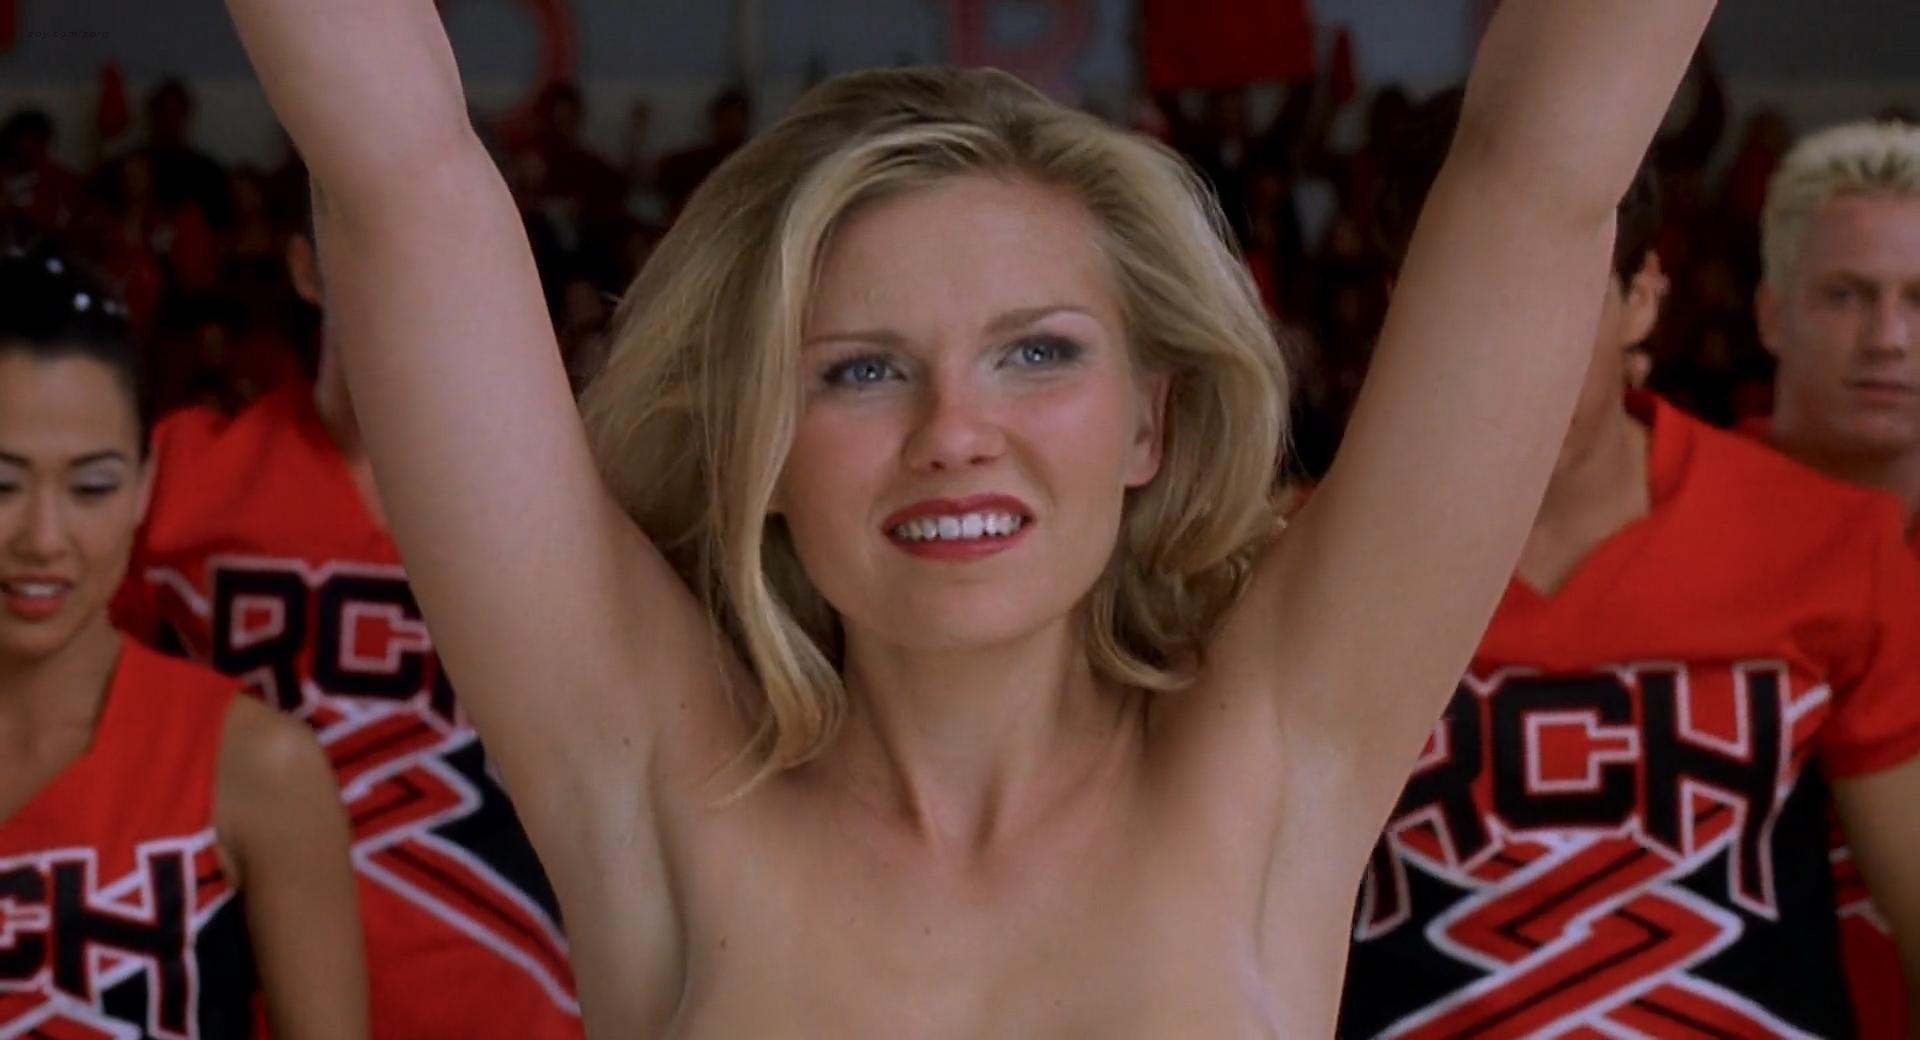 Kirsten Dunst hot bra and panties Eliza Dushku hot bikini - Bring It On 2000 HD 1080p BluRay (4)